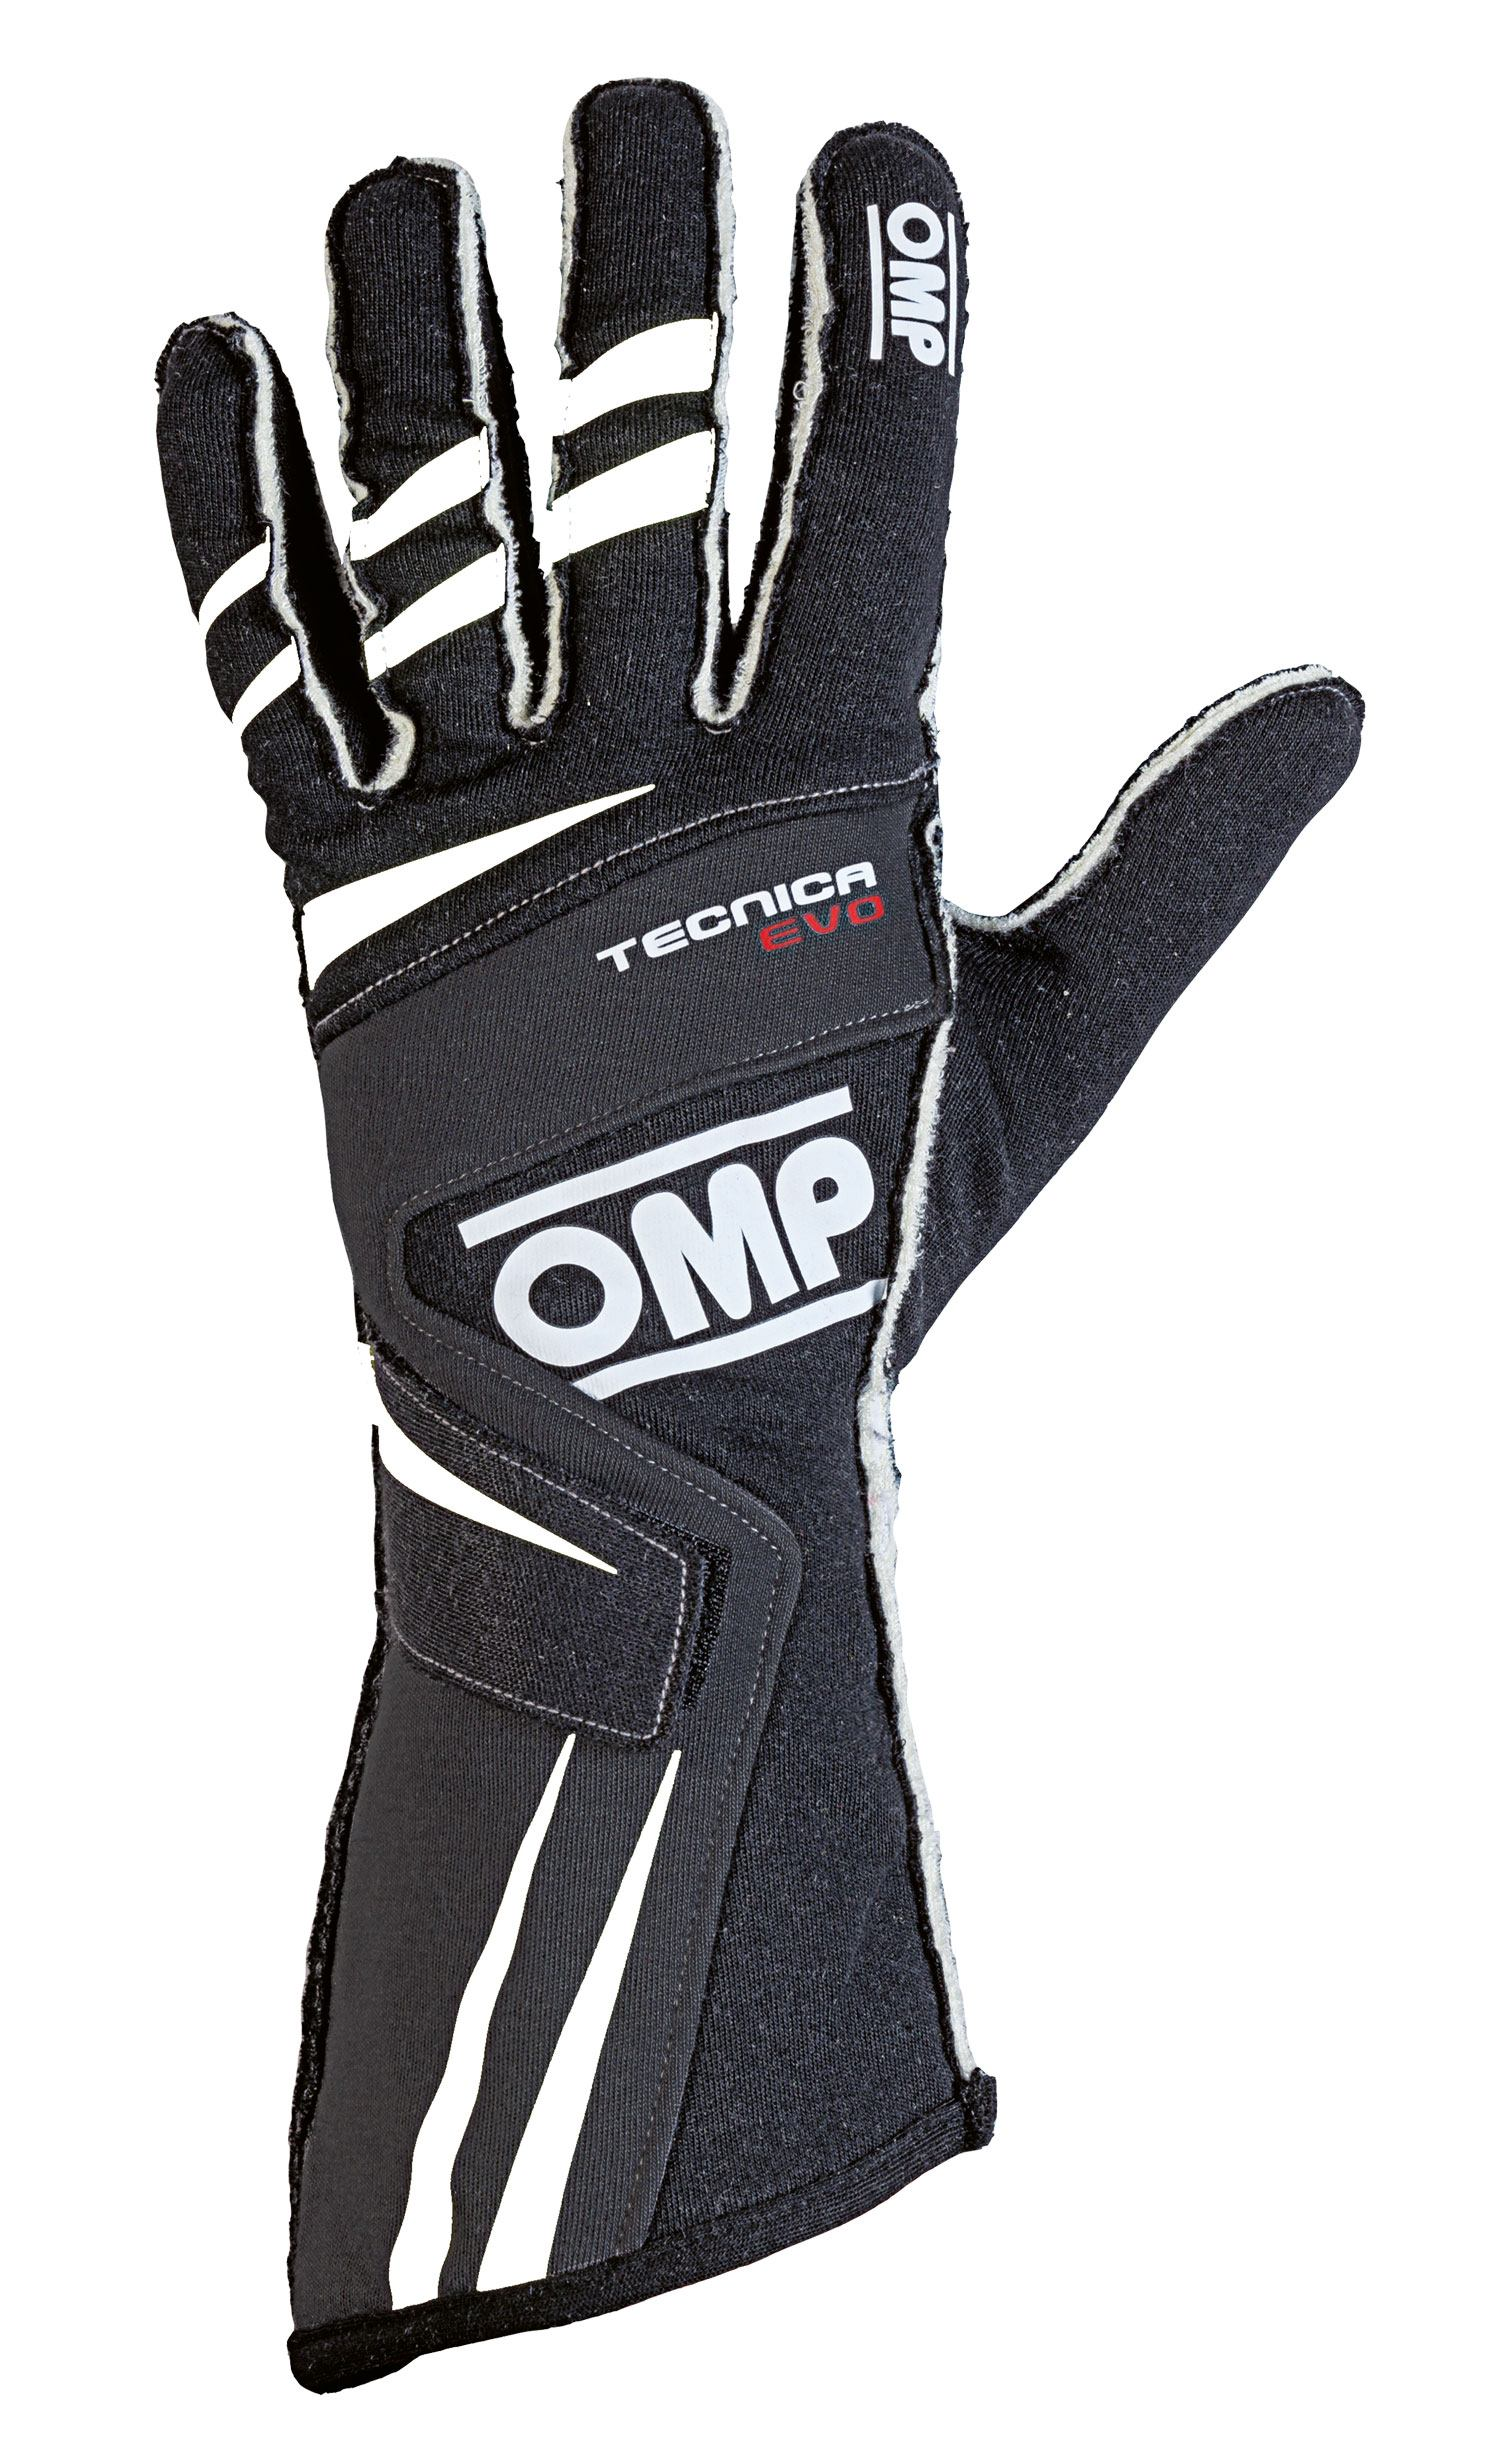 OMP Fahrerhandschuh Tecnica Evo, schwarz/weiß